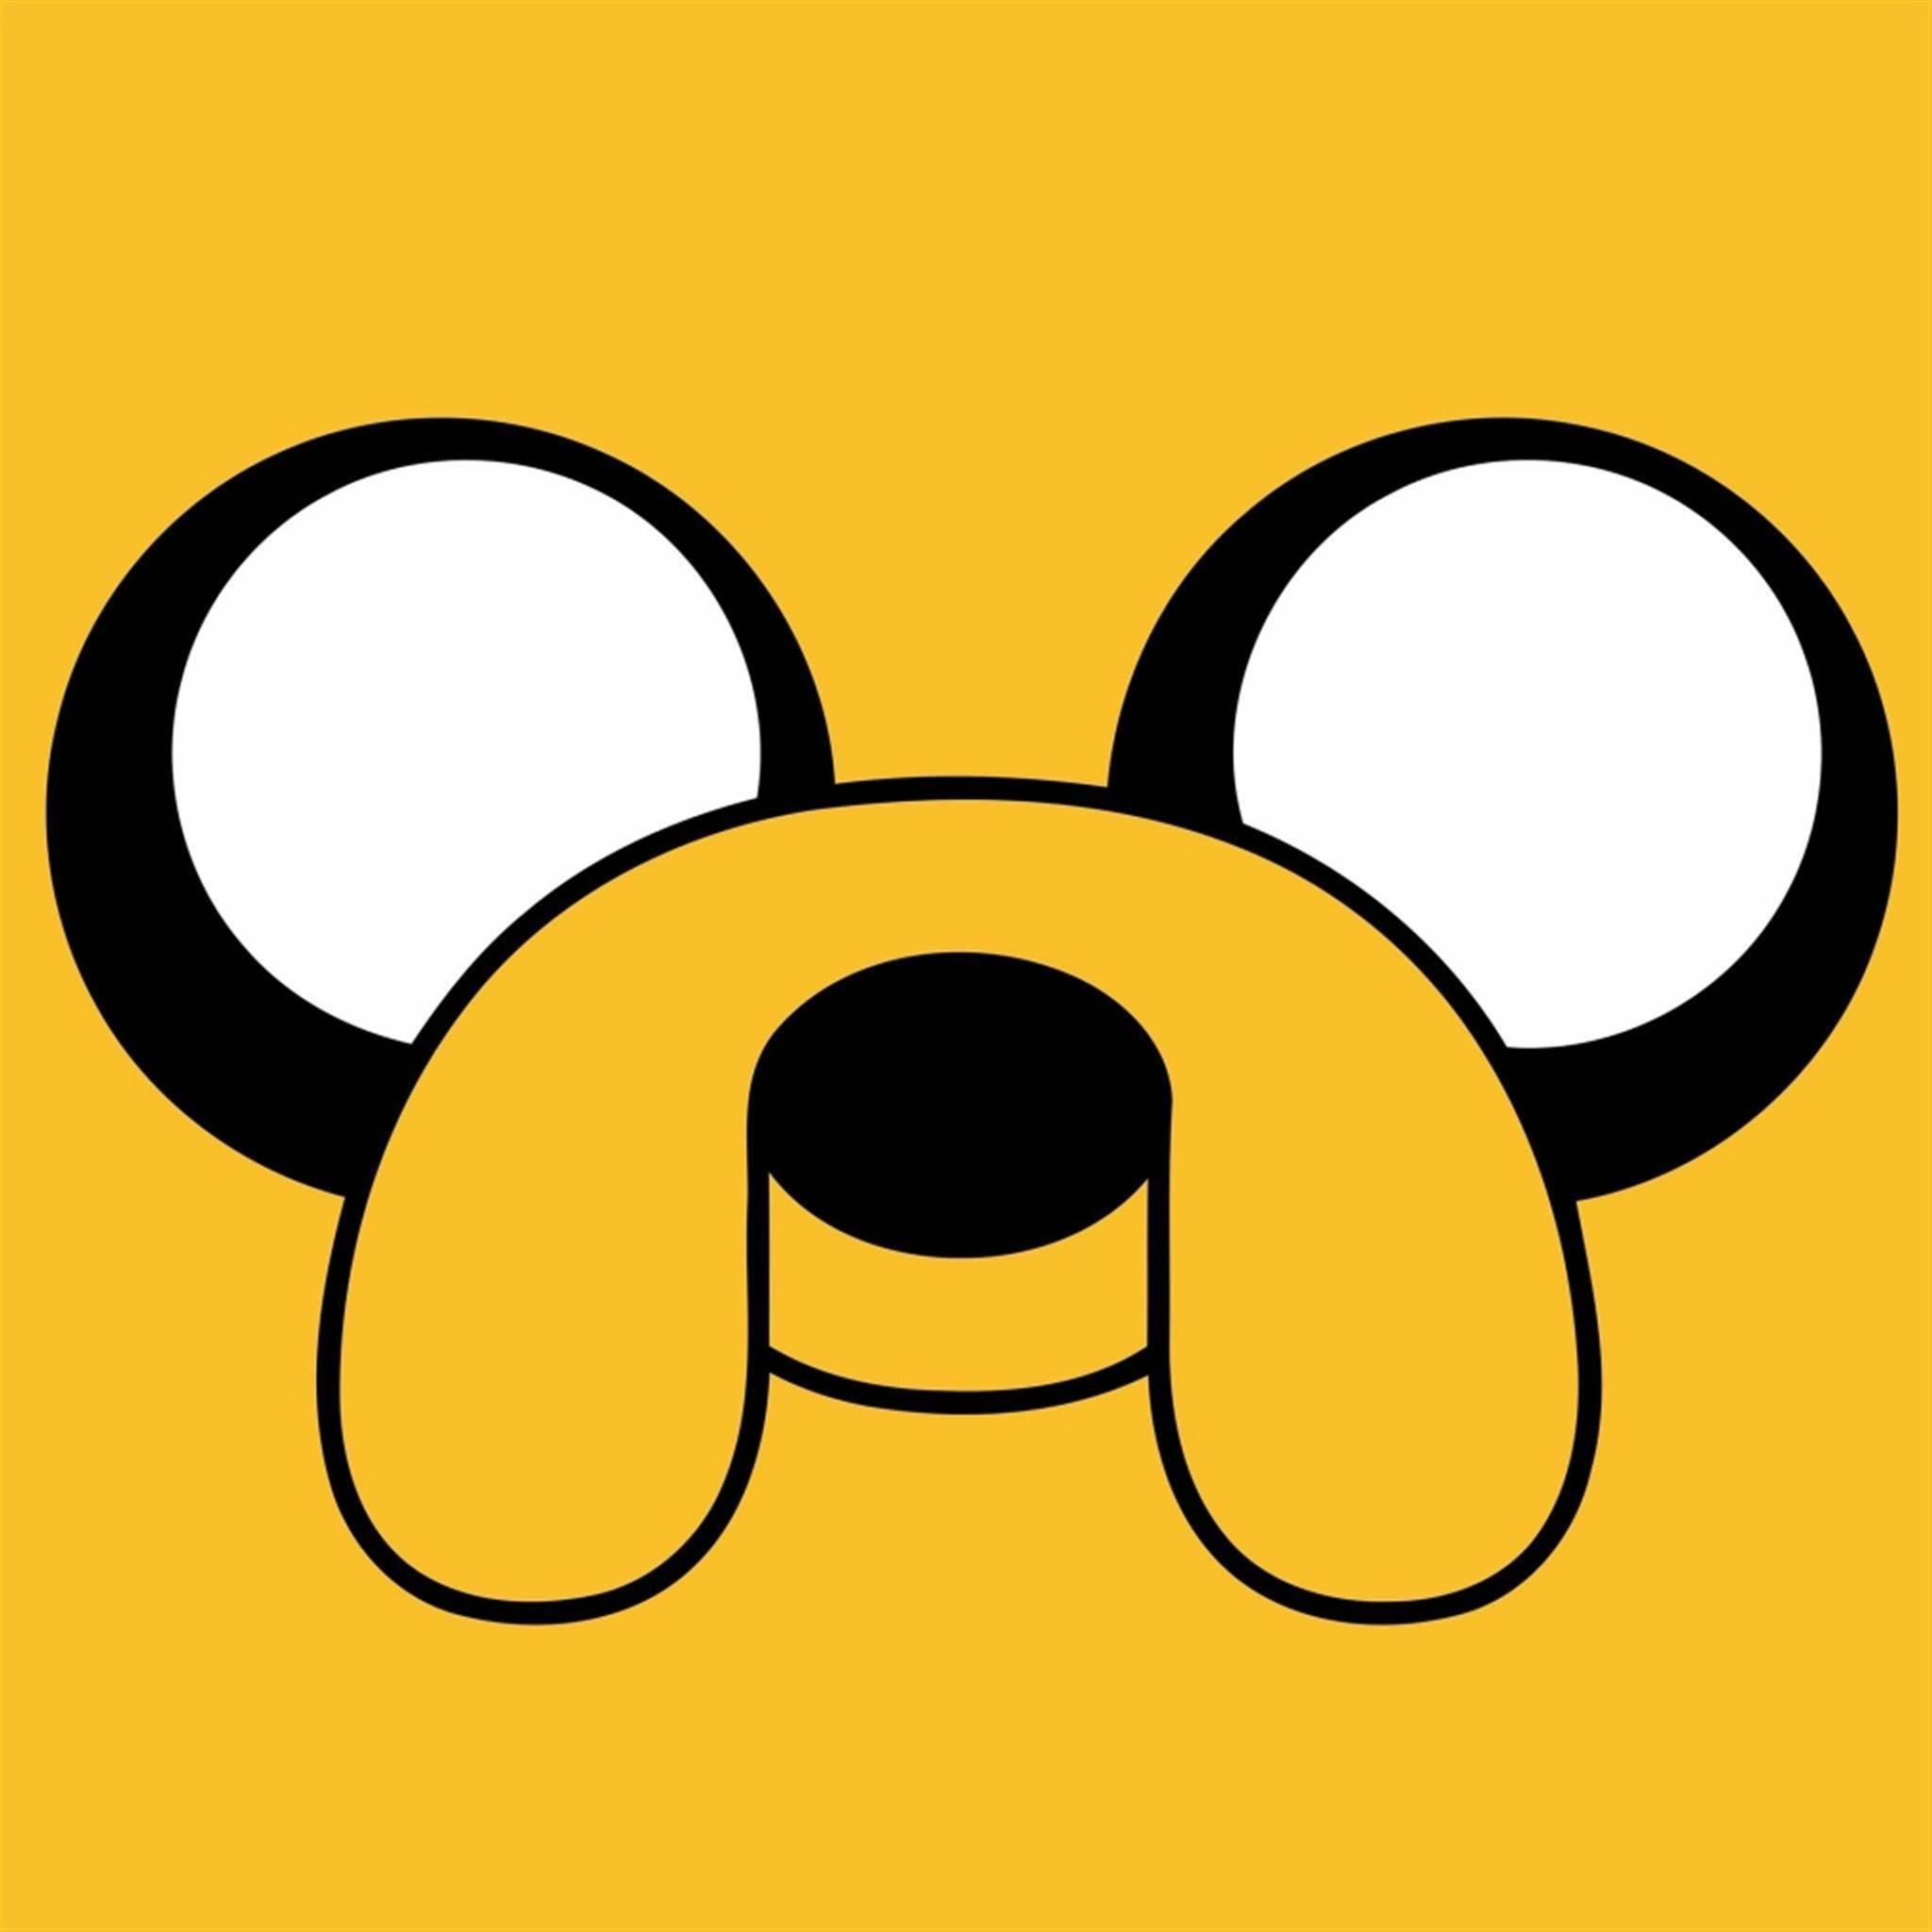 Cute 09 Ipad Mini 2 Wallpapers Hd And Ipad Mini Wallpapers Adventure Time Personajes Jake De Adventure Time Jake Hora De Aventura